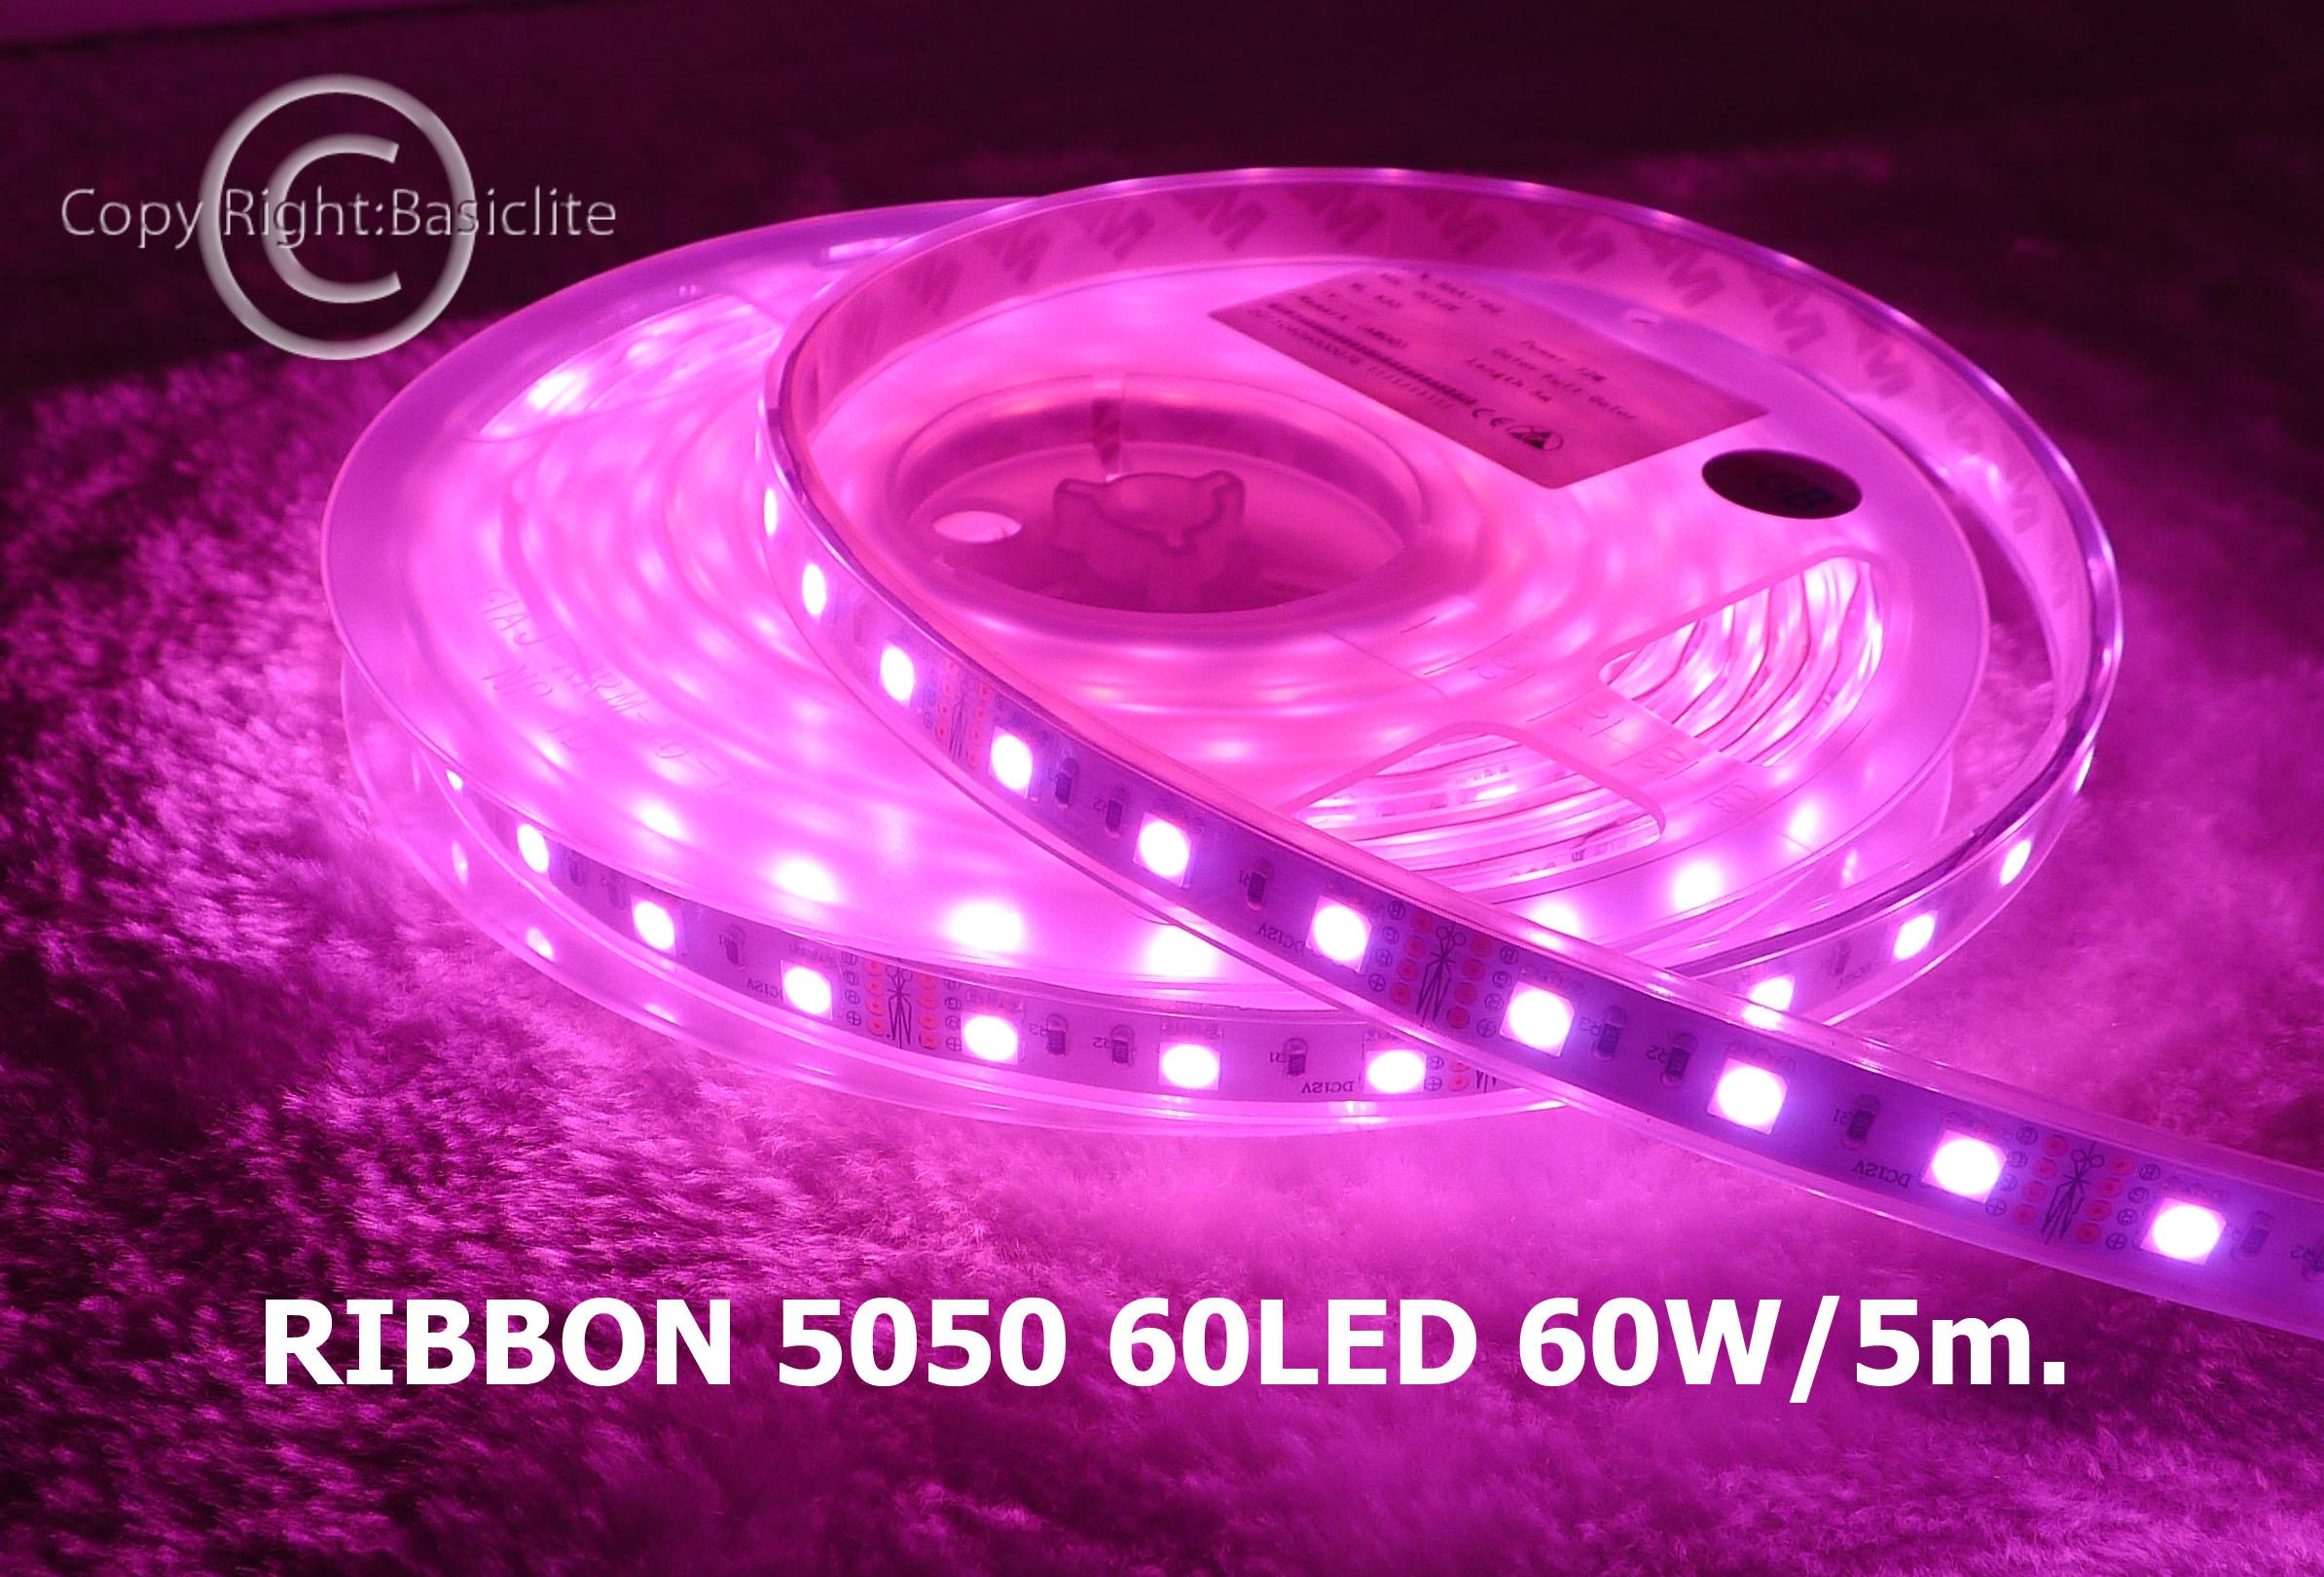 LED RIBBON 60LED 60W (RGB)/ Code: 1-11-00006